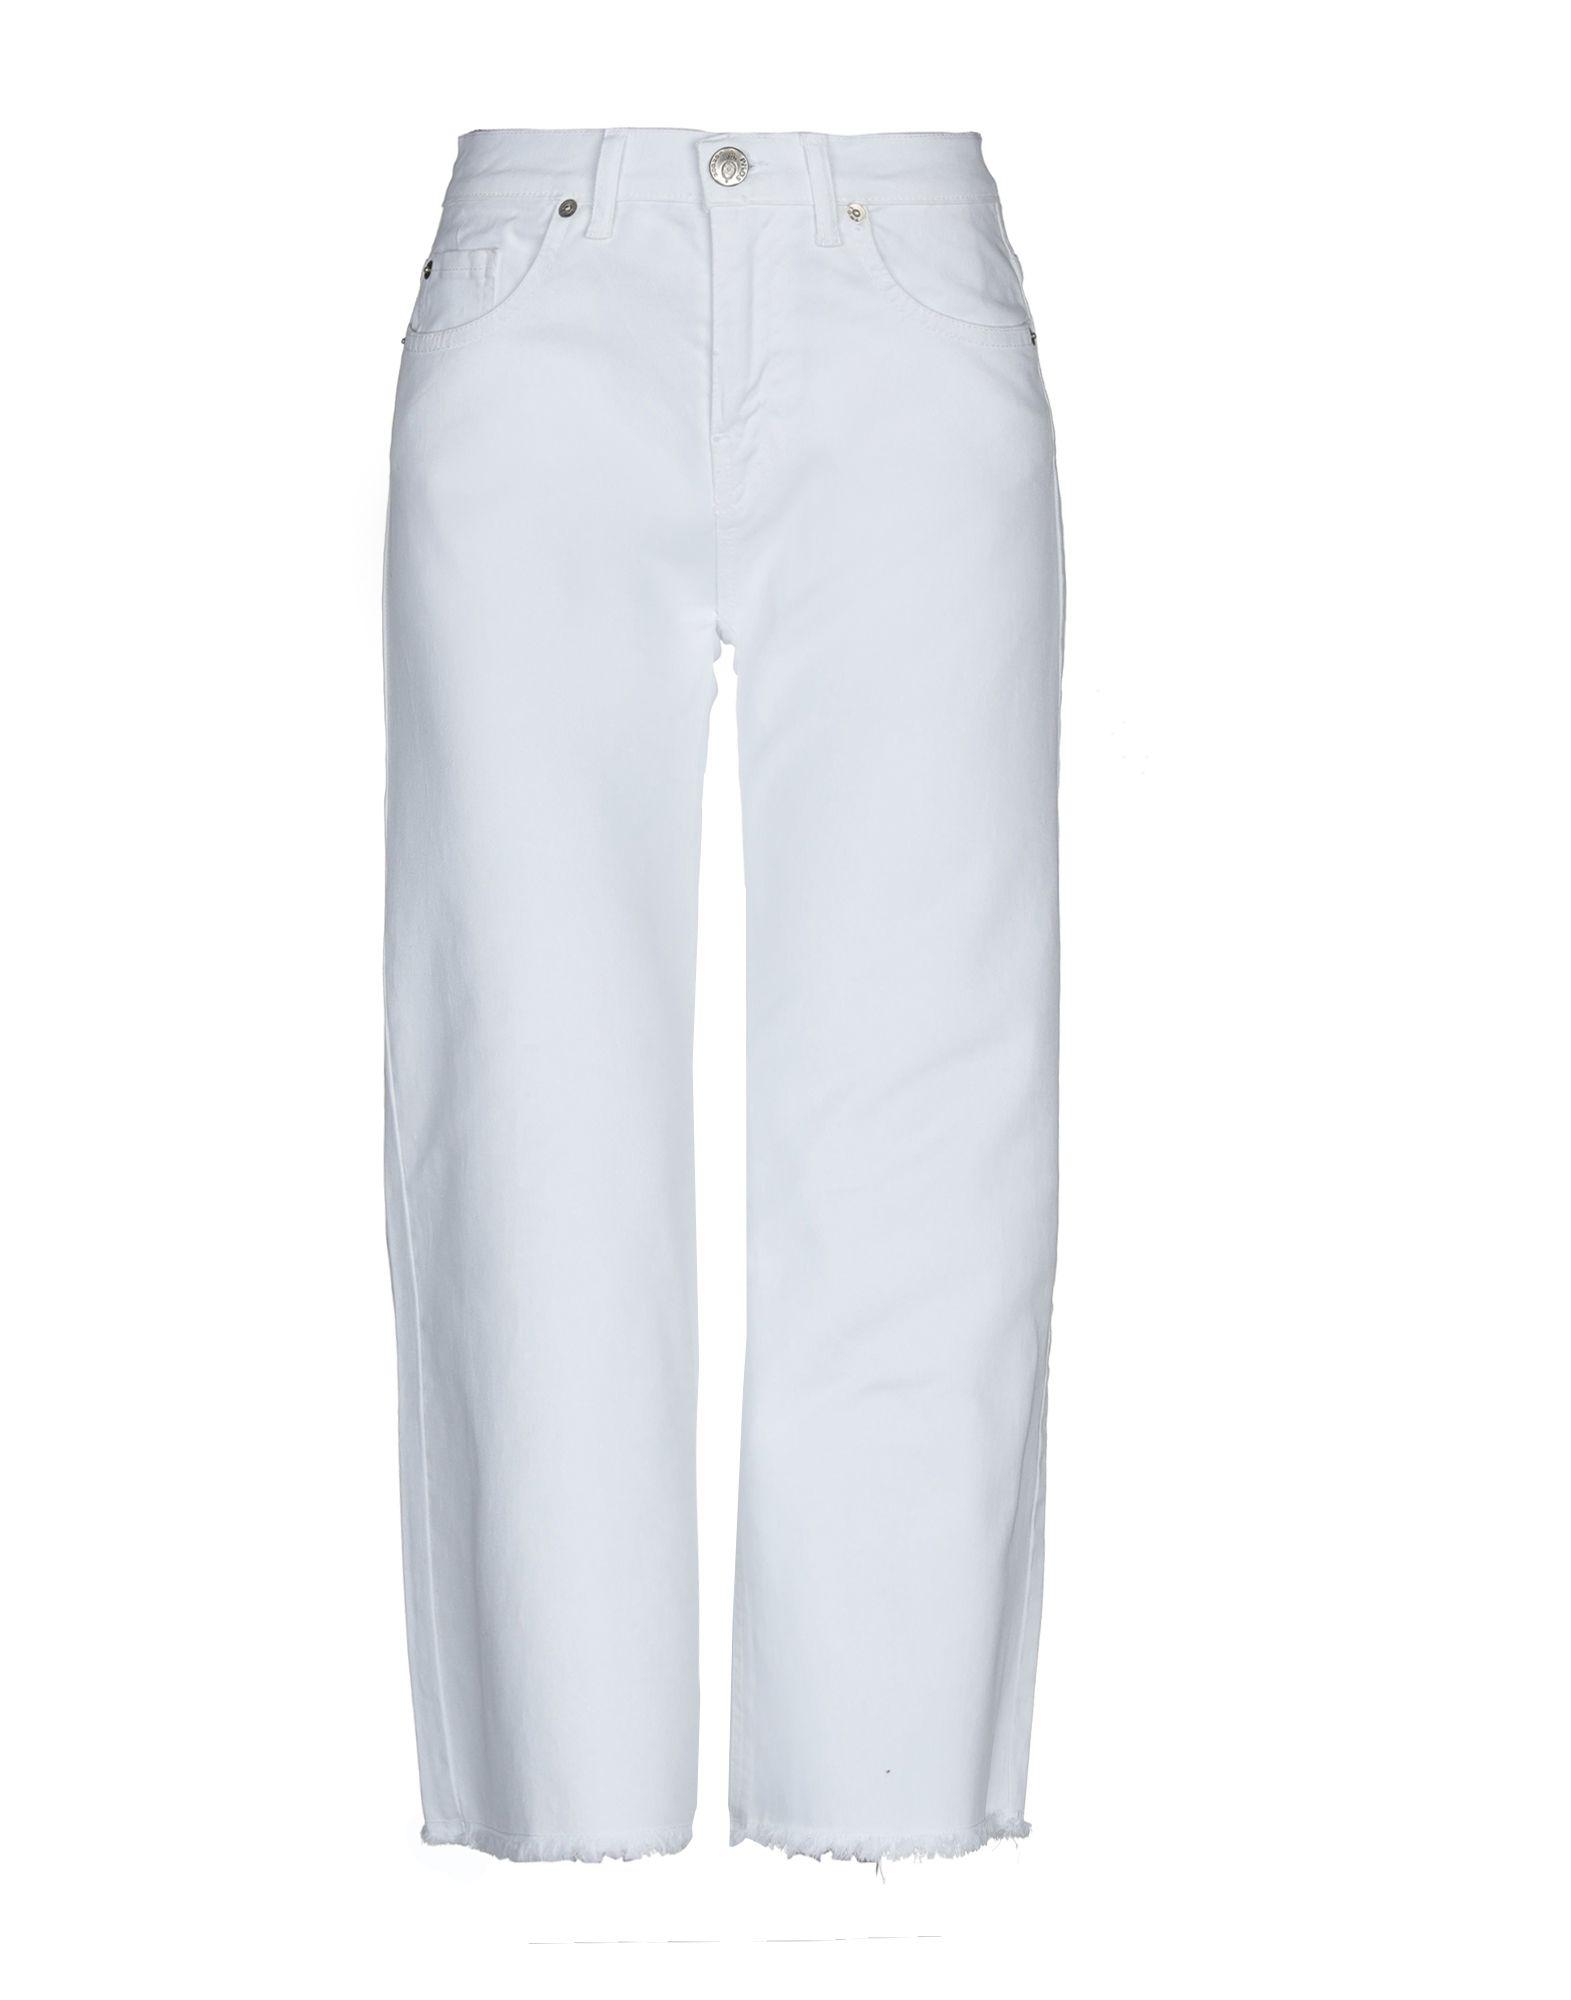 PMDS PREMIUM MOOD DENIM SUPERIOR Джинсовые брюки-капри denim mood джинсовые брюки